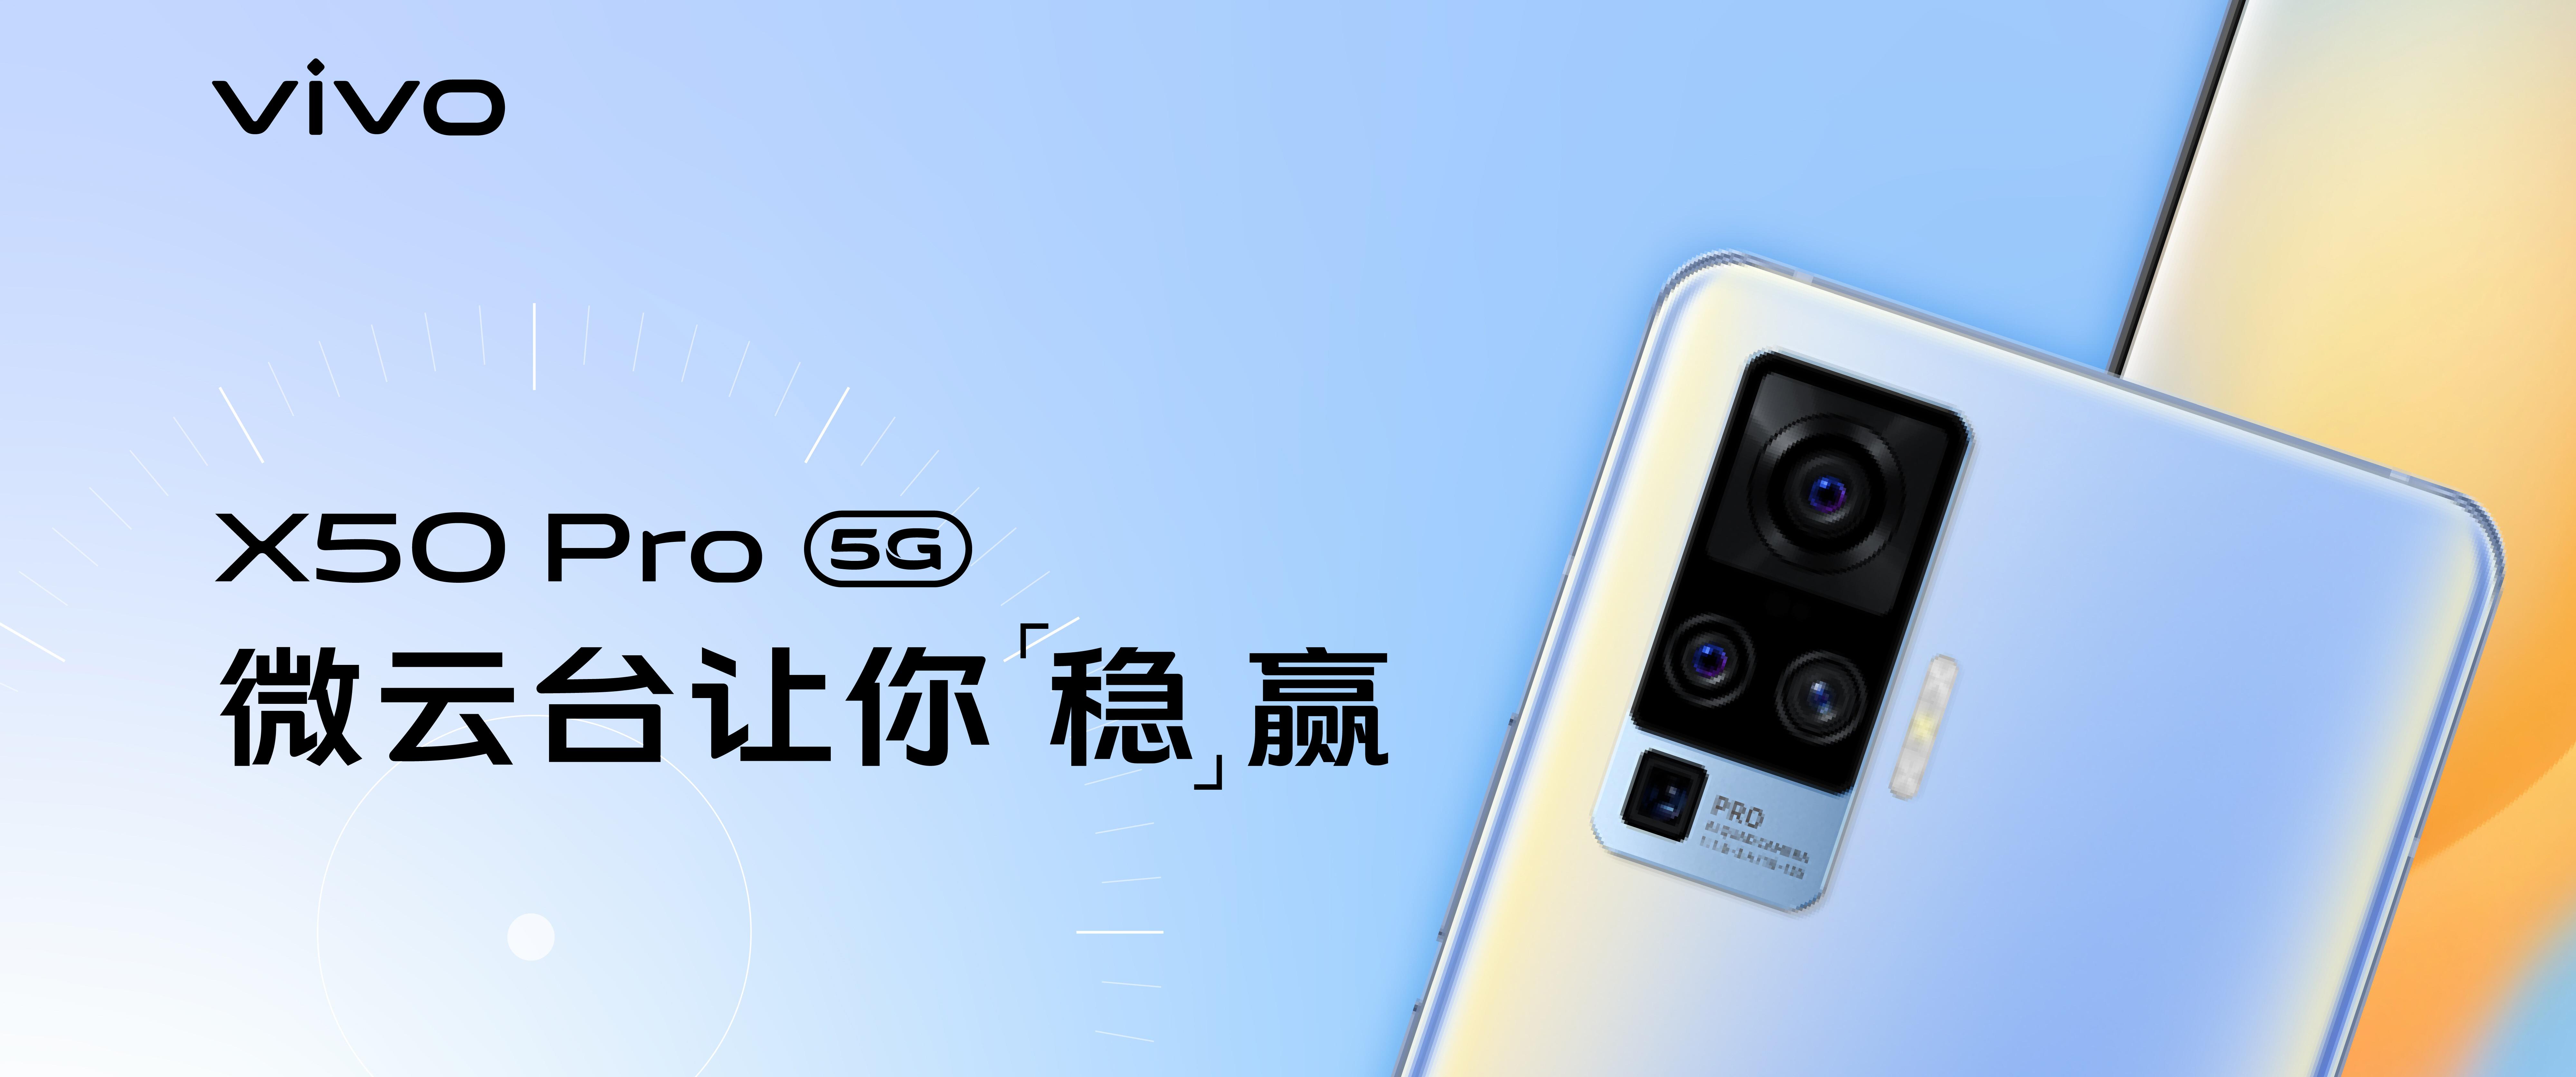 X50 Pro 5G微云台让你稳赢